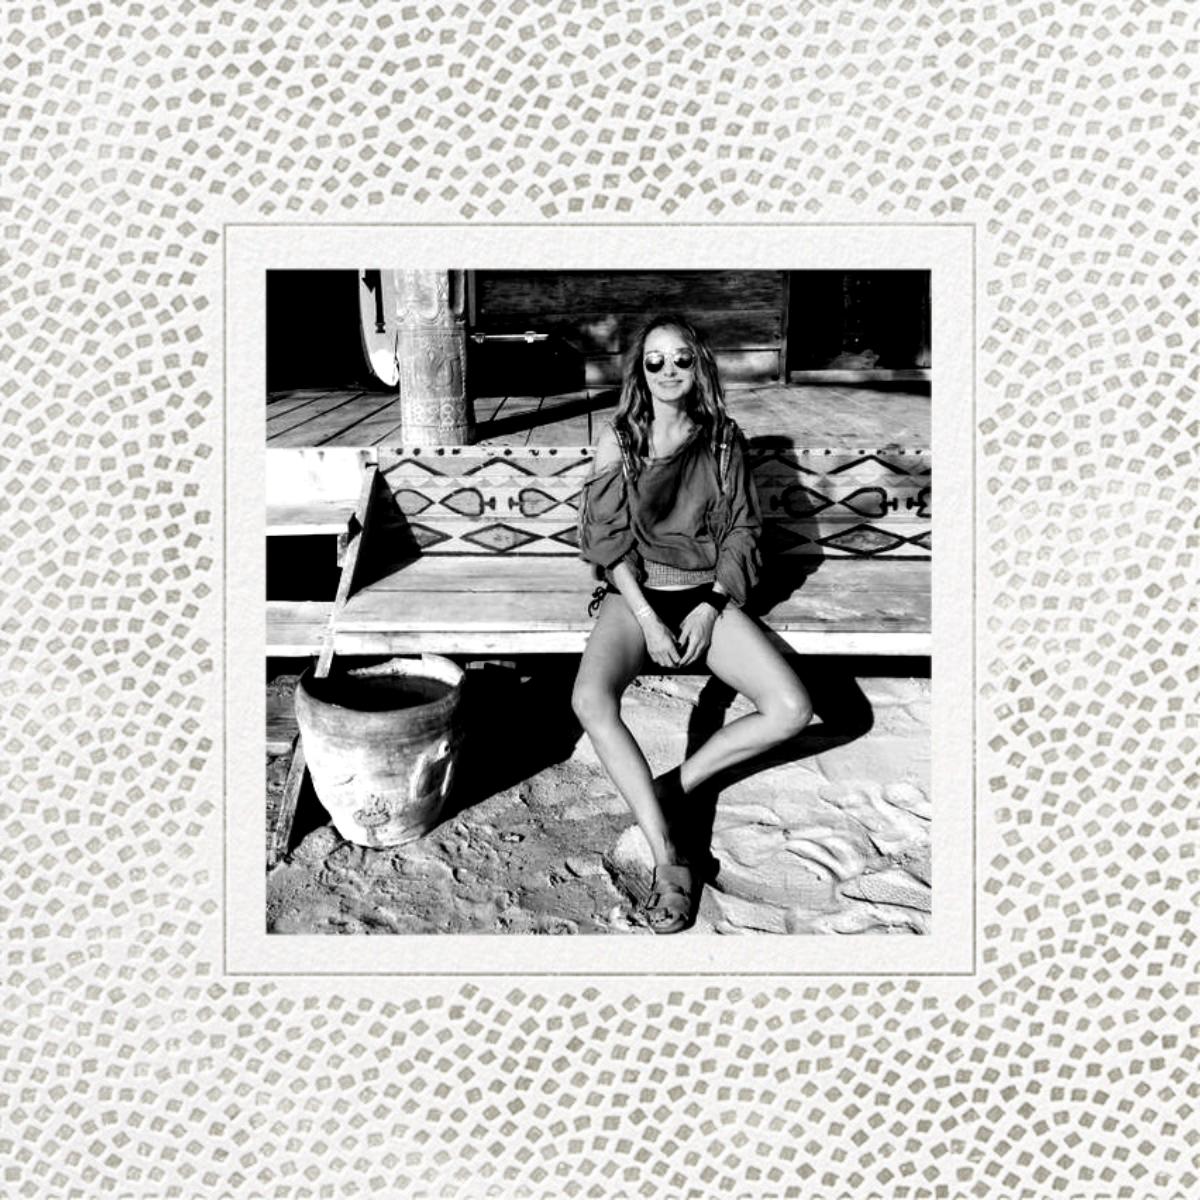 Konfetti (Photo) - Silver - Kelly Wearstler - Adult birthday